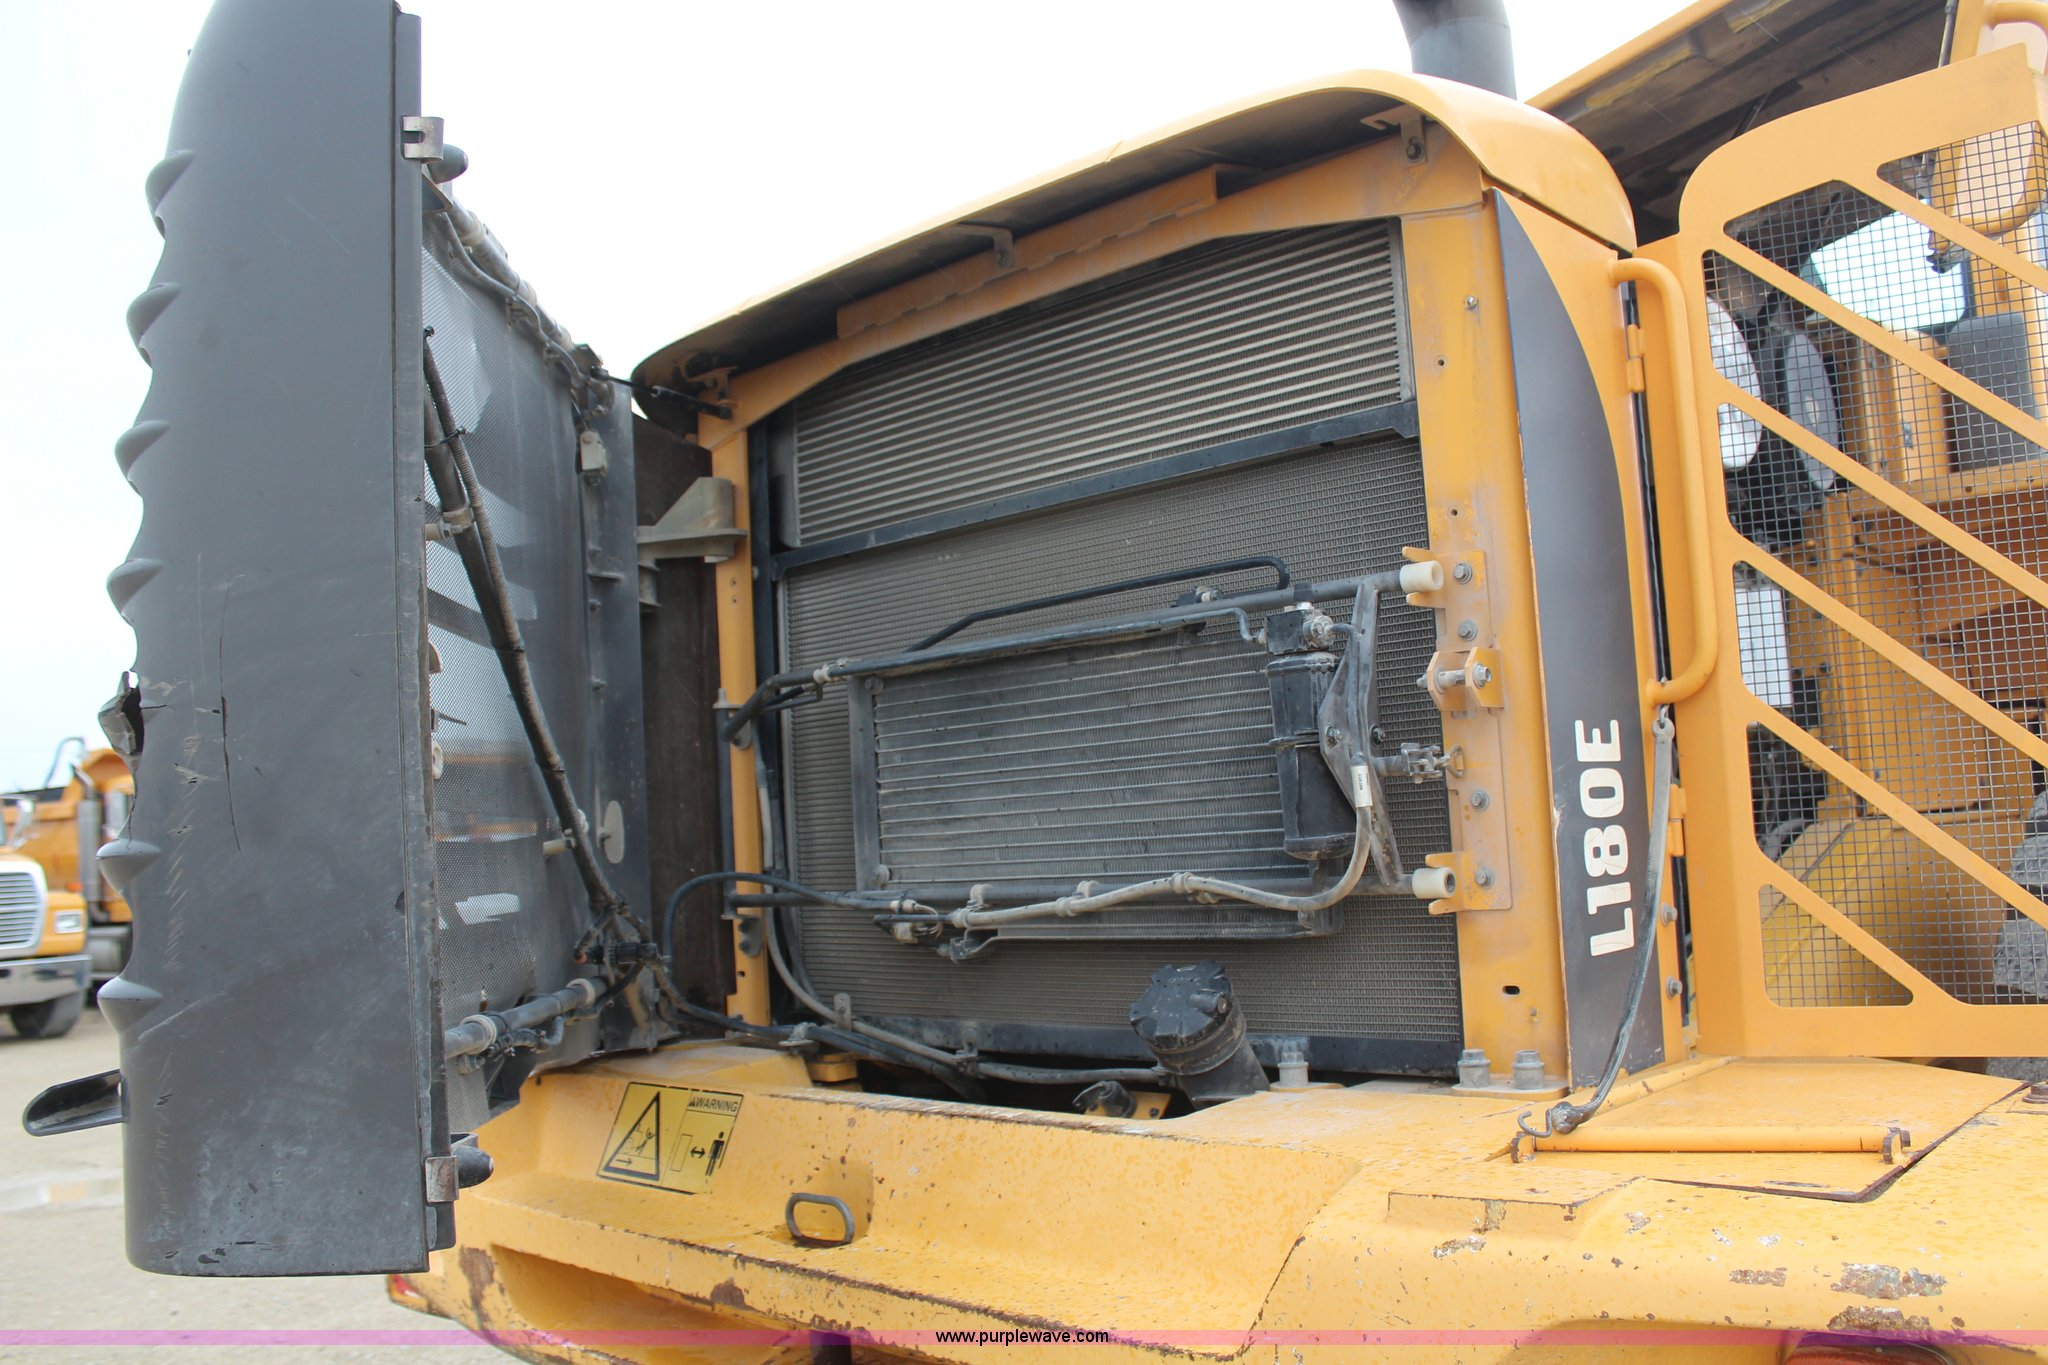 ... Volvo L180E wheel loader Full size in new window ...